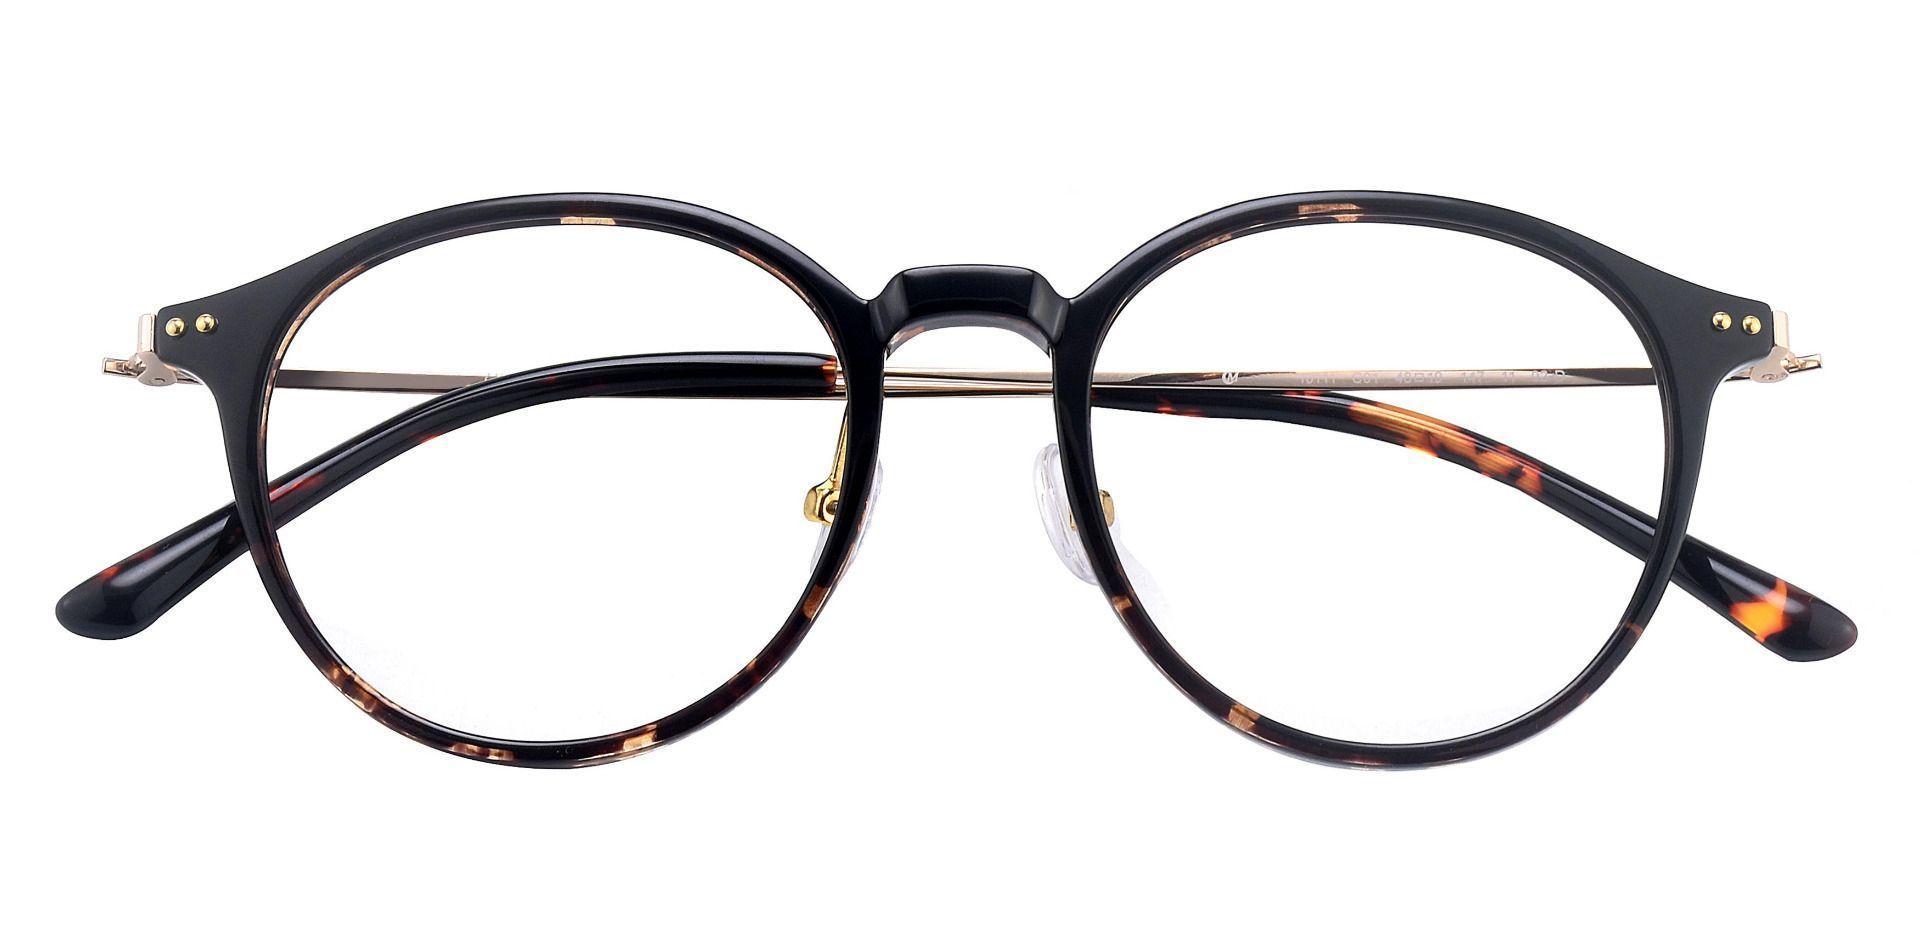 Meyer Round Prescription Glasses - Tortoise